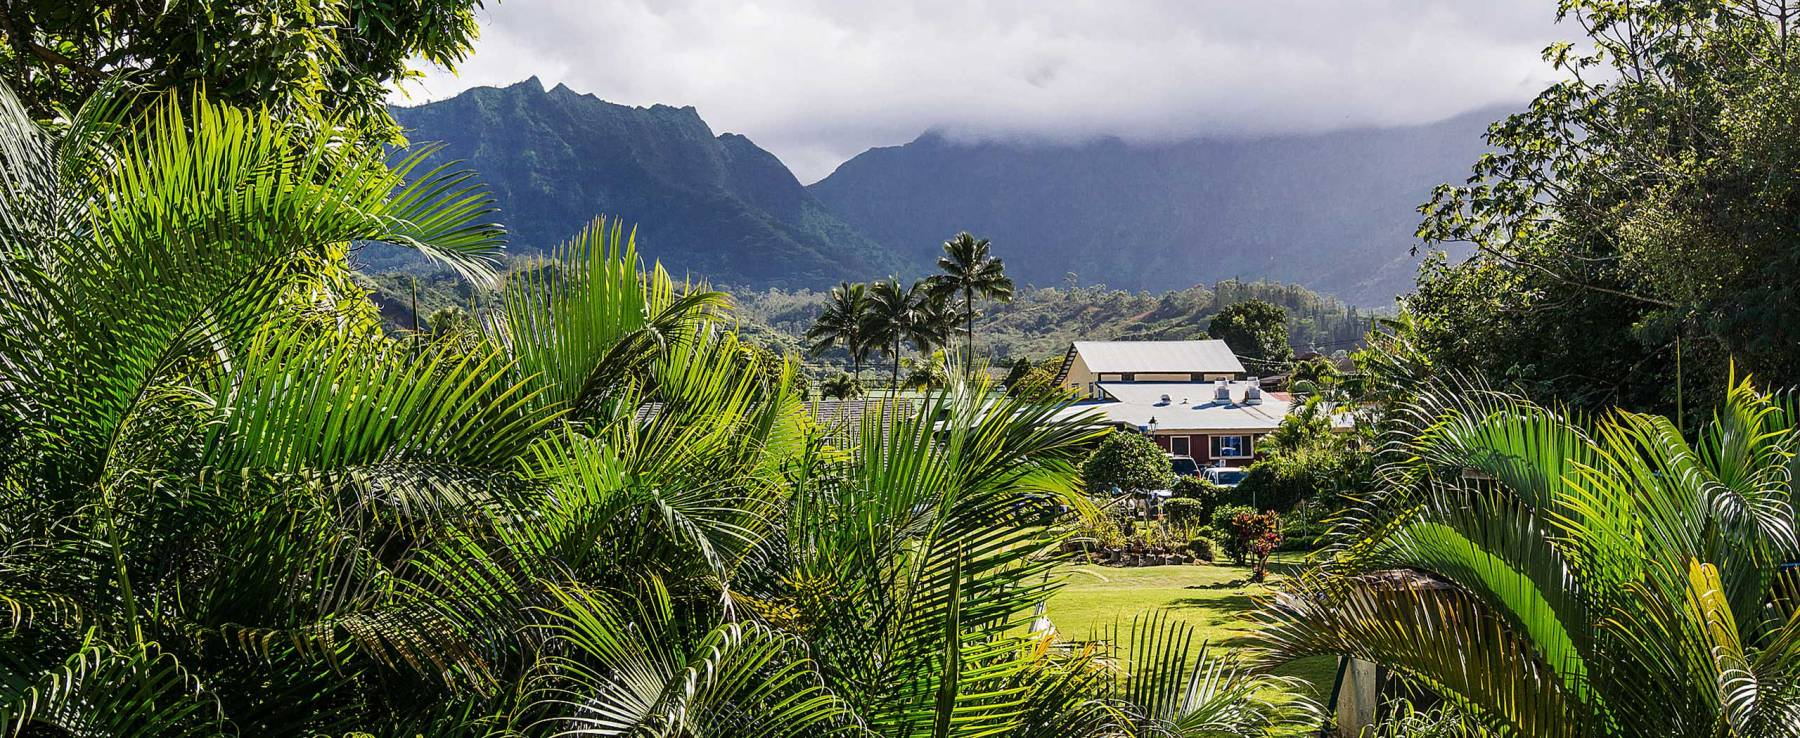 North Shore Preserve Kauai | Oceanfront Realty International